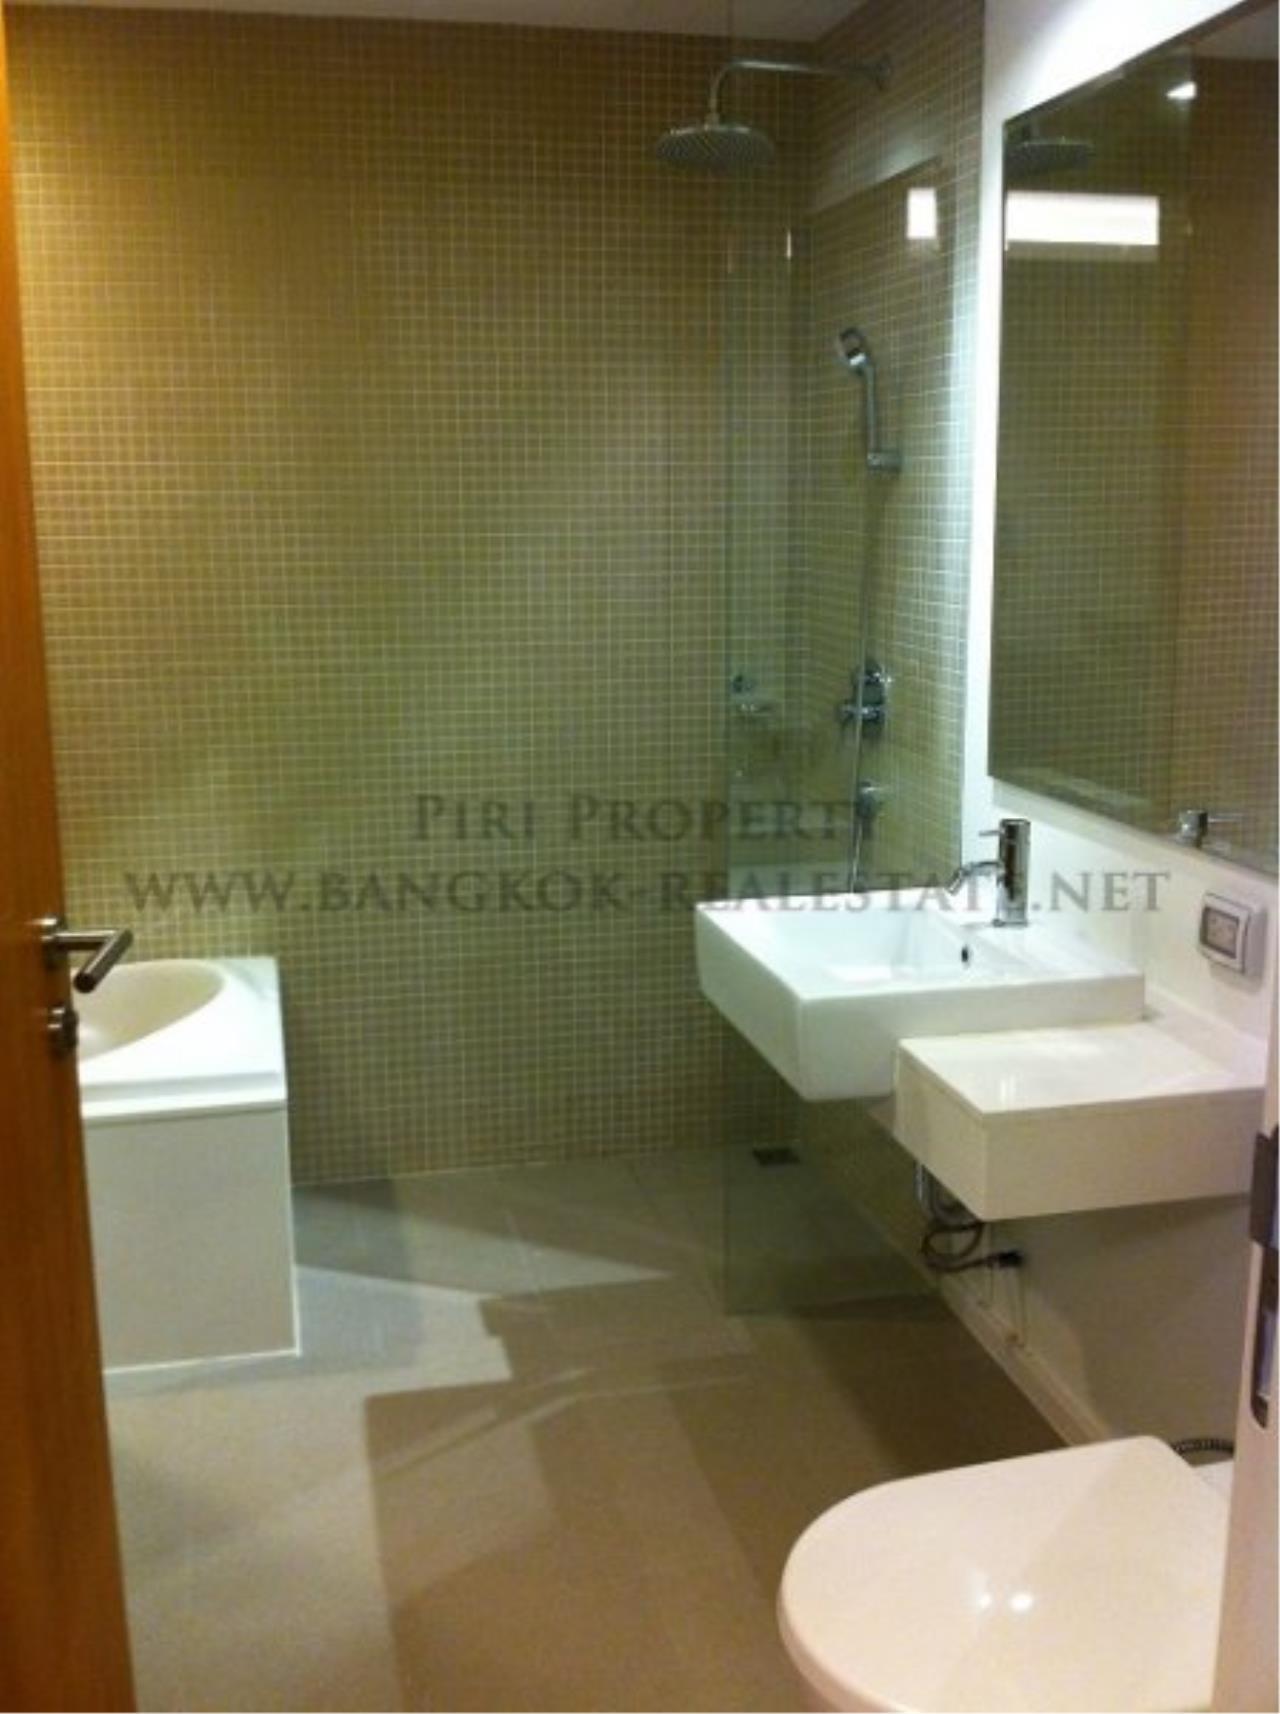 Piri Property Agency's The Nest Ploenchit for Rent - Cozy 1 Bedroom Condo for Rent 4